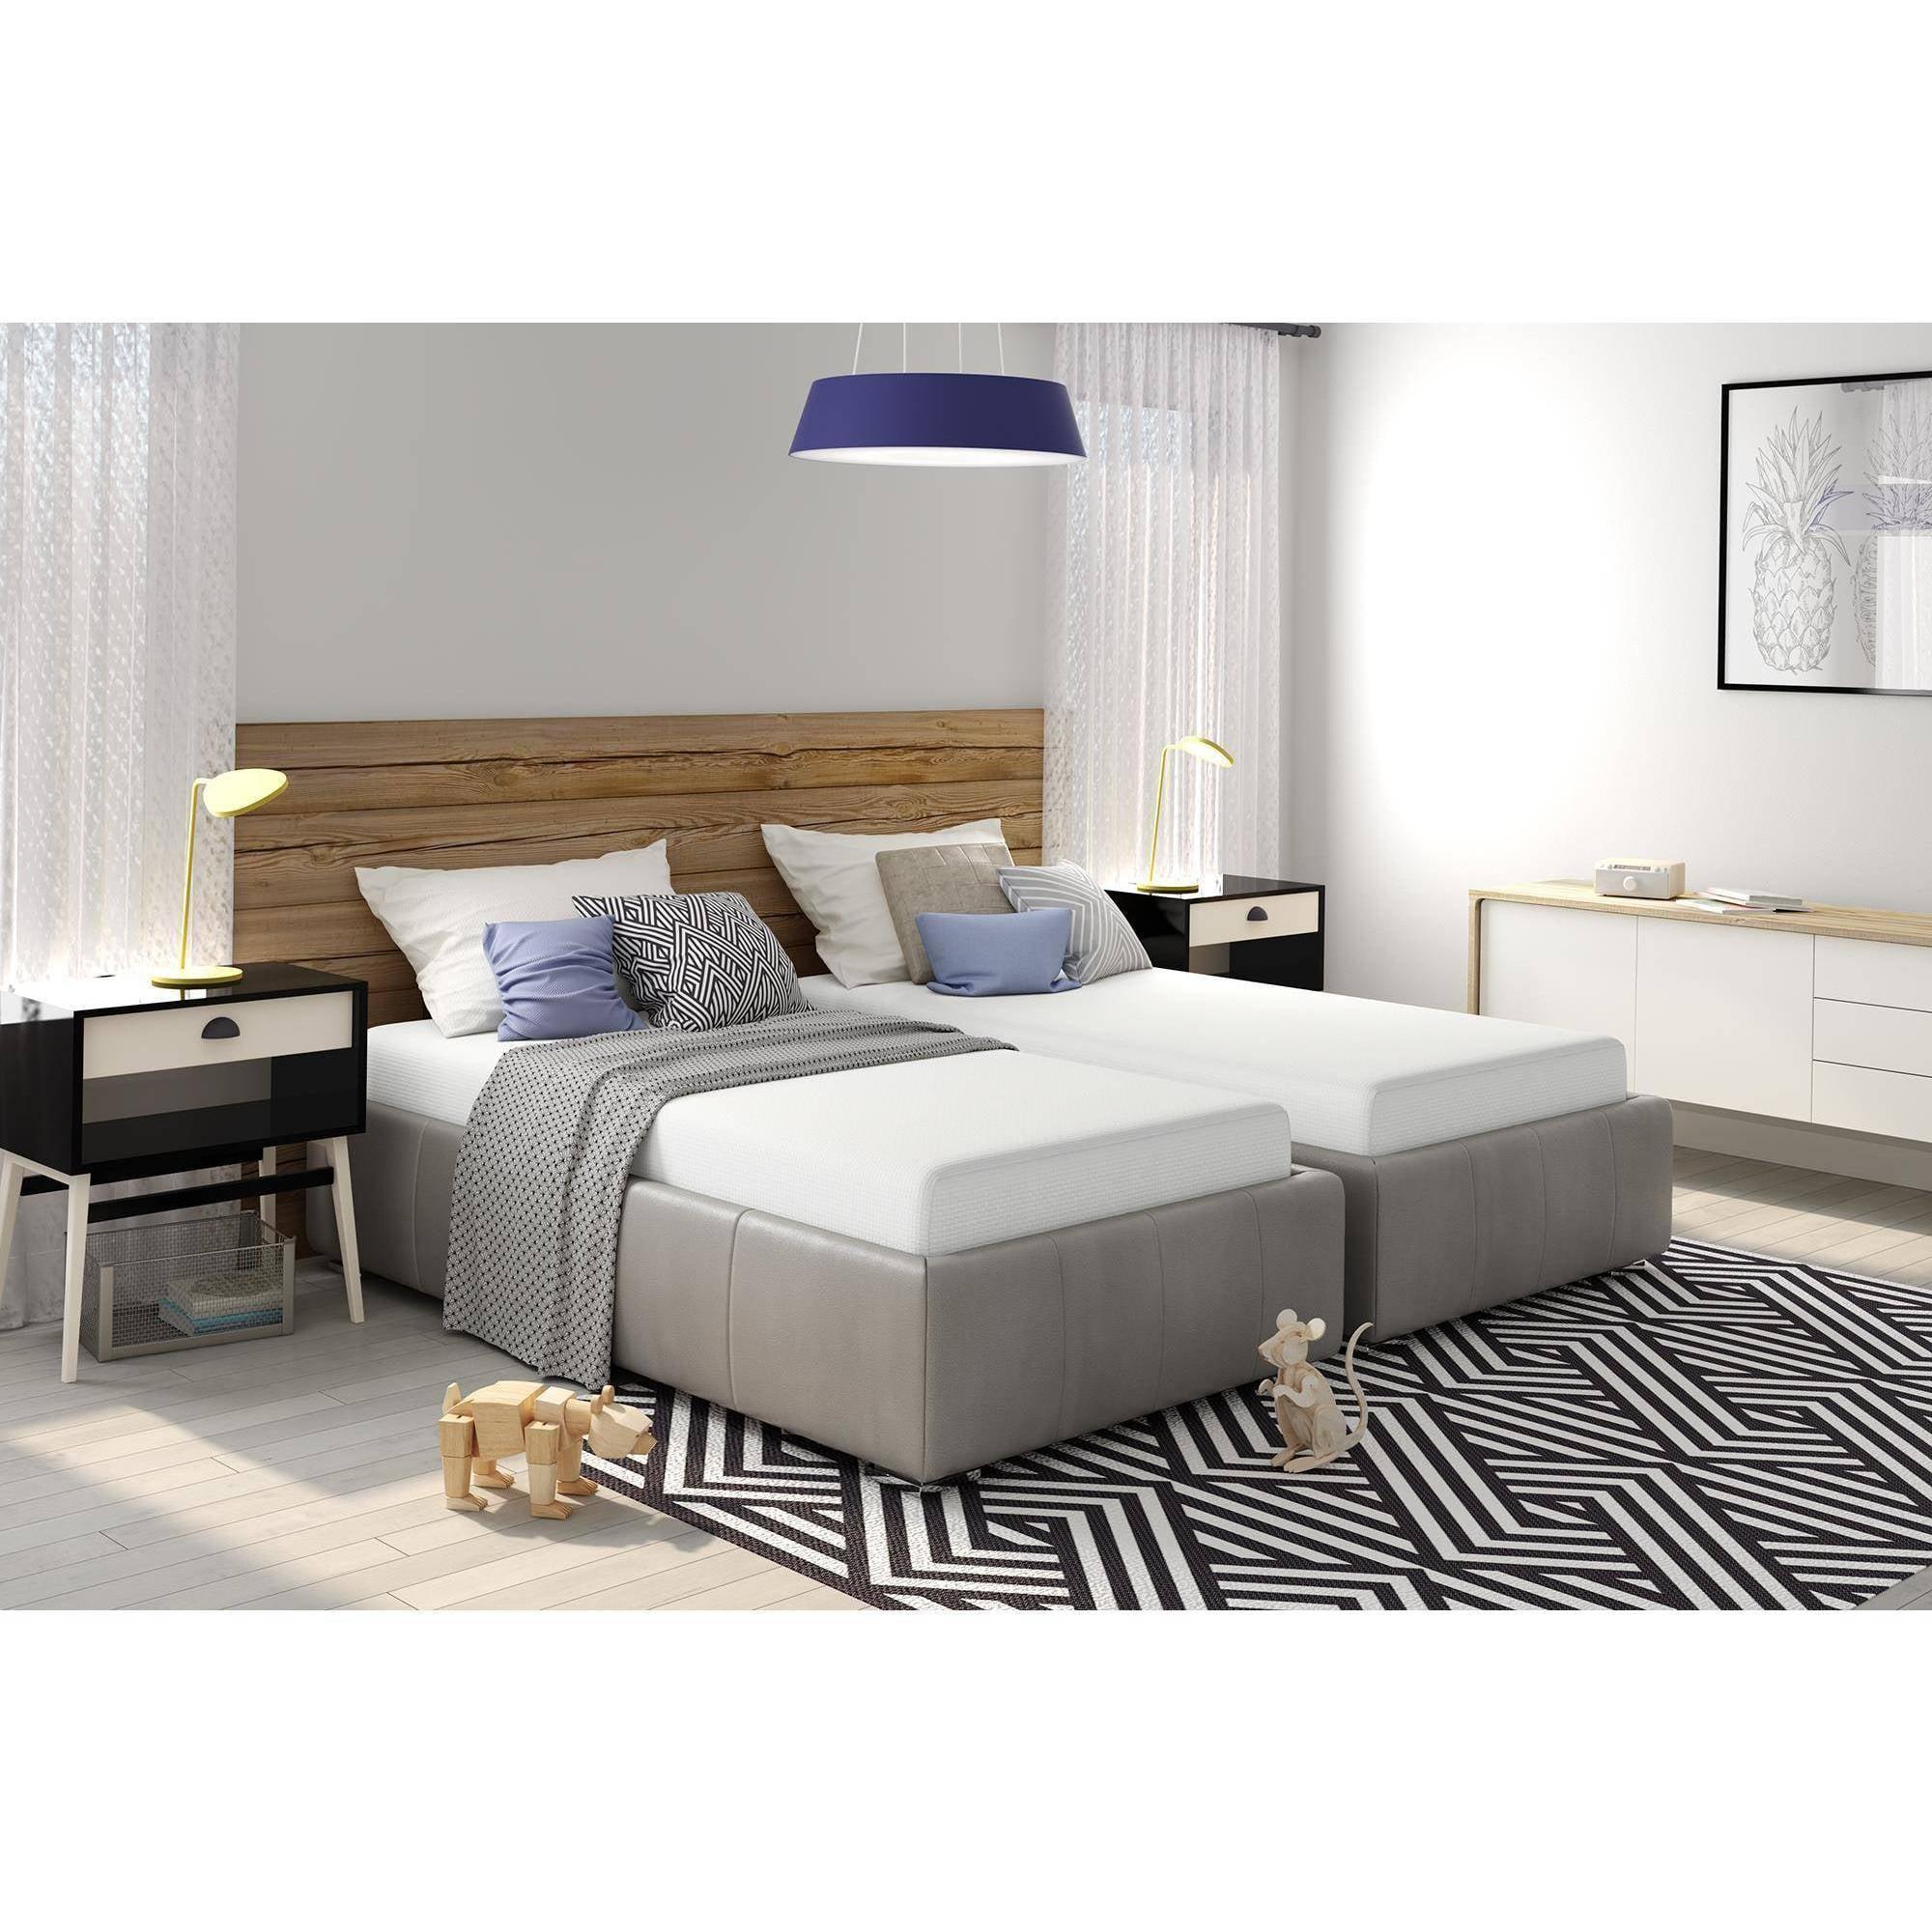 "Signature Sleep Gold CertiPUR-US Inspire 8"" Memory Foam Mattress, Multiple  Sizes"